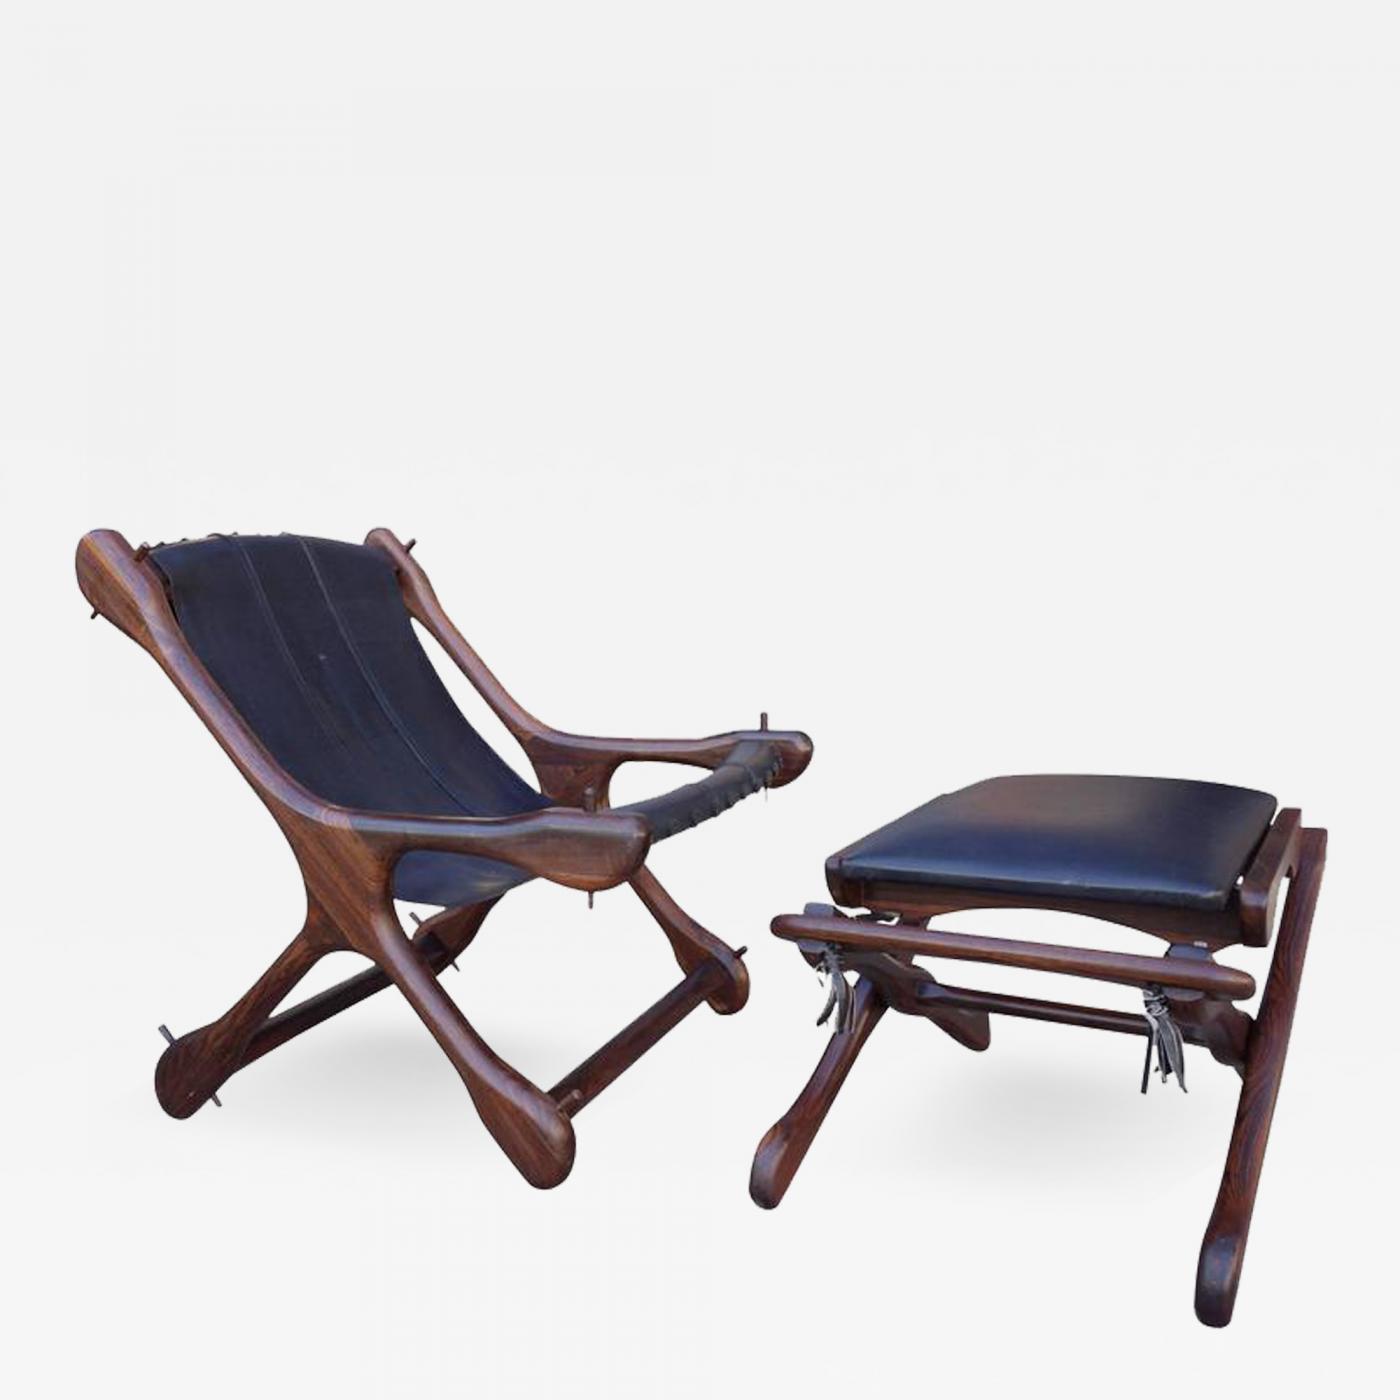 Terrific Don Shoemaker Mid Century Don Shoemaker Leather Sling Chair And Ottoman In Rosewood Spiritservingveterans Wood Chair Design Ideas Spiritservingveteransorg